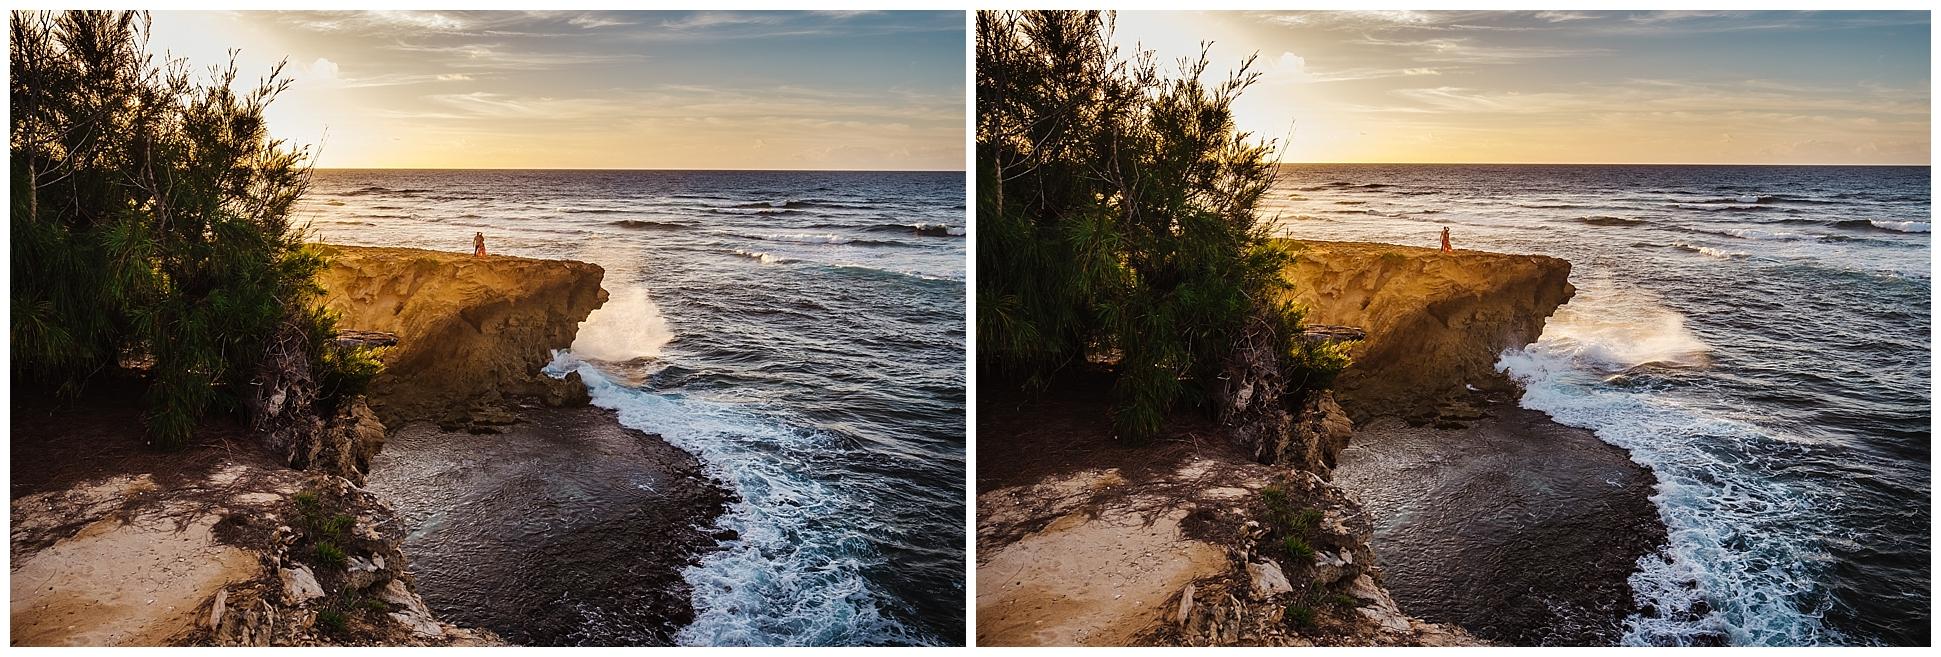 hawaiin-honeymoon-sunrise-portraits-kauai-grand-hystt-destination-photographer_0010.jpg